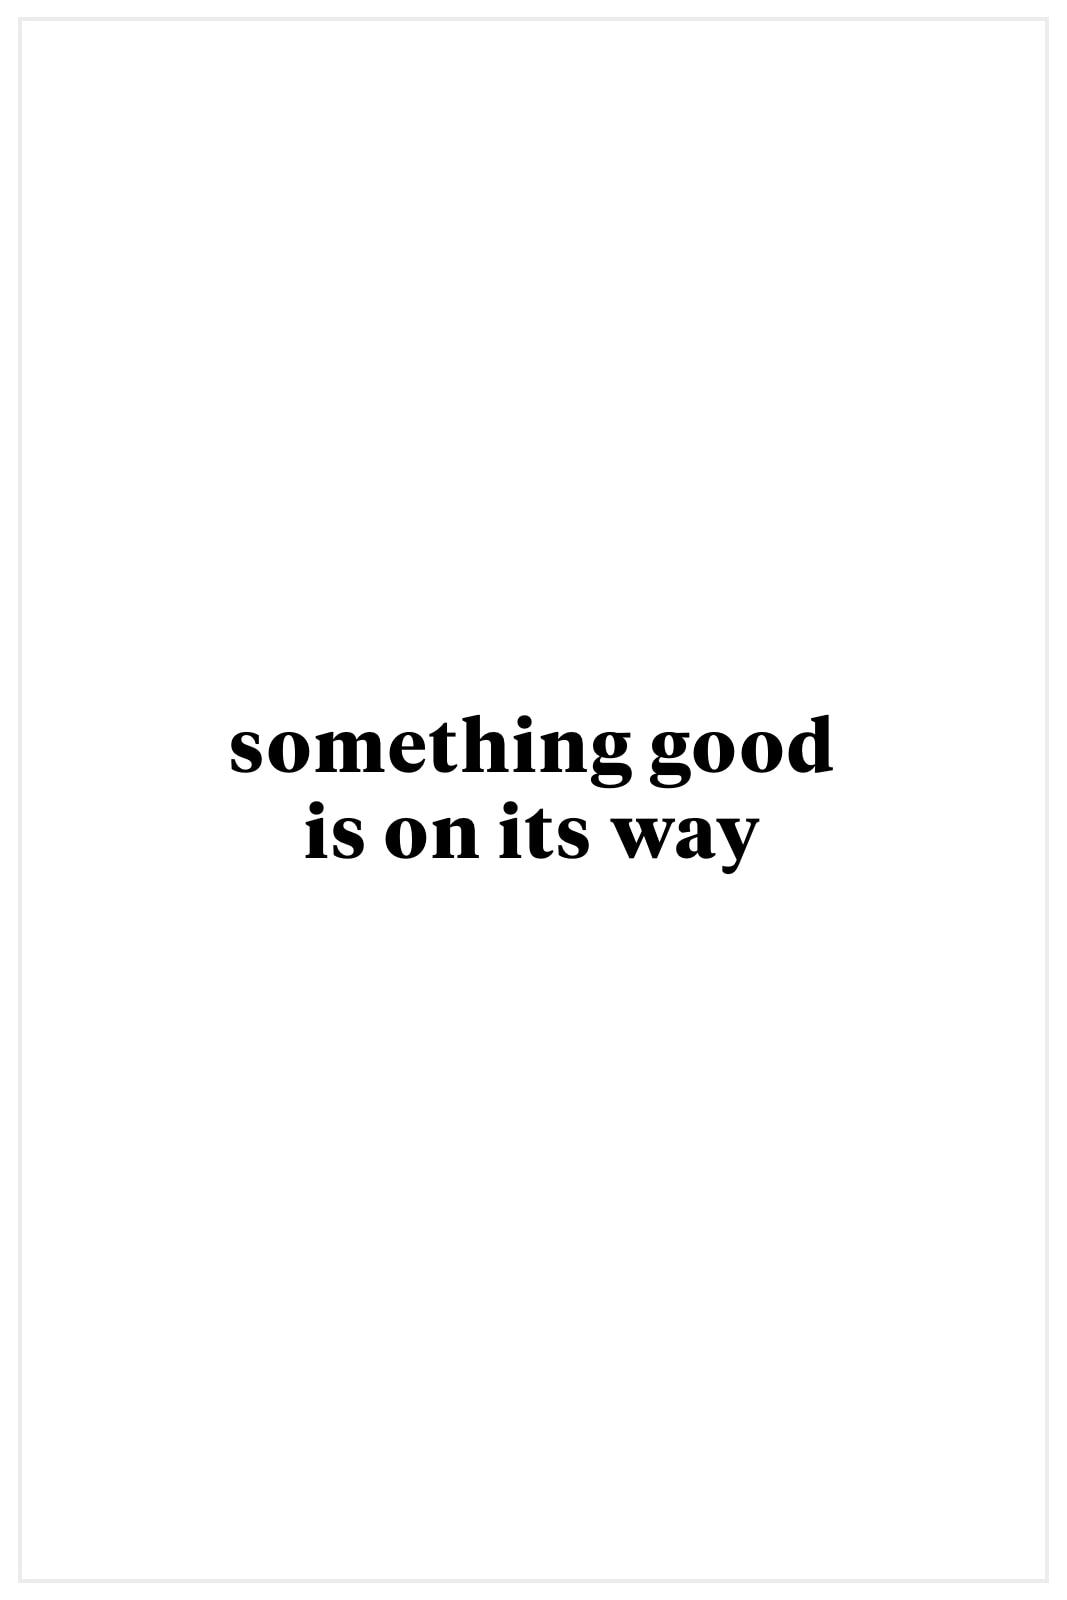 New balance 574 Worn Metallic Sneaker